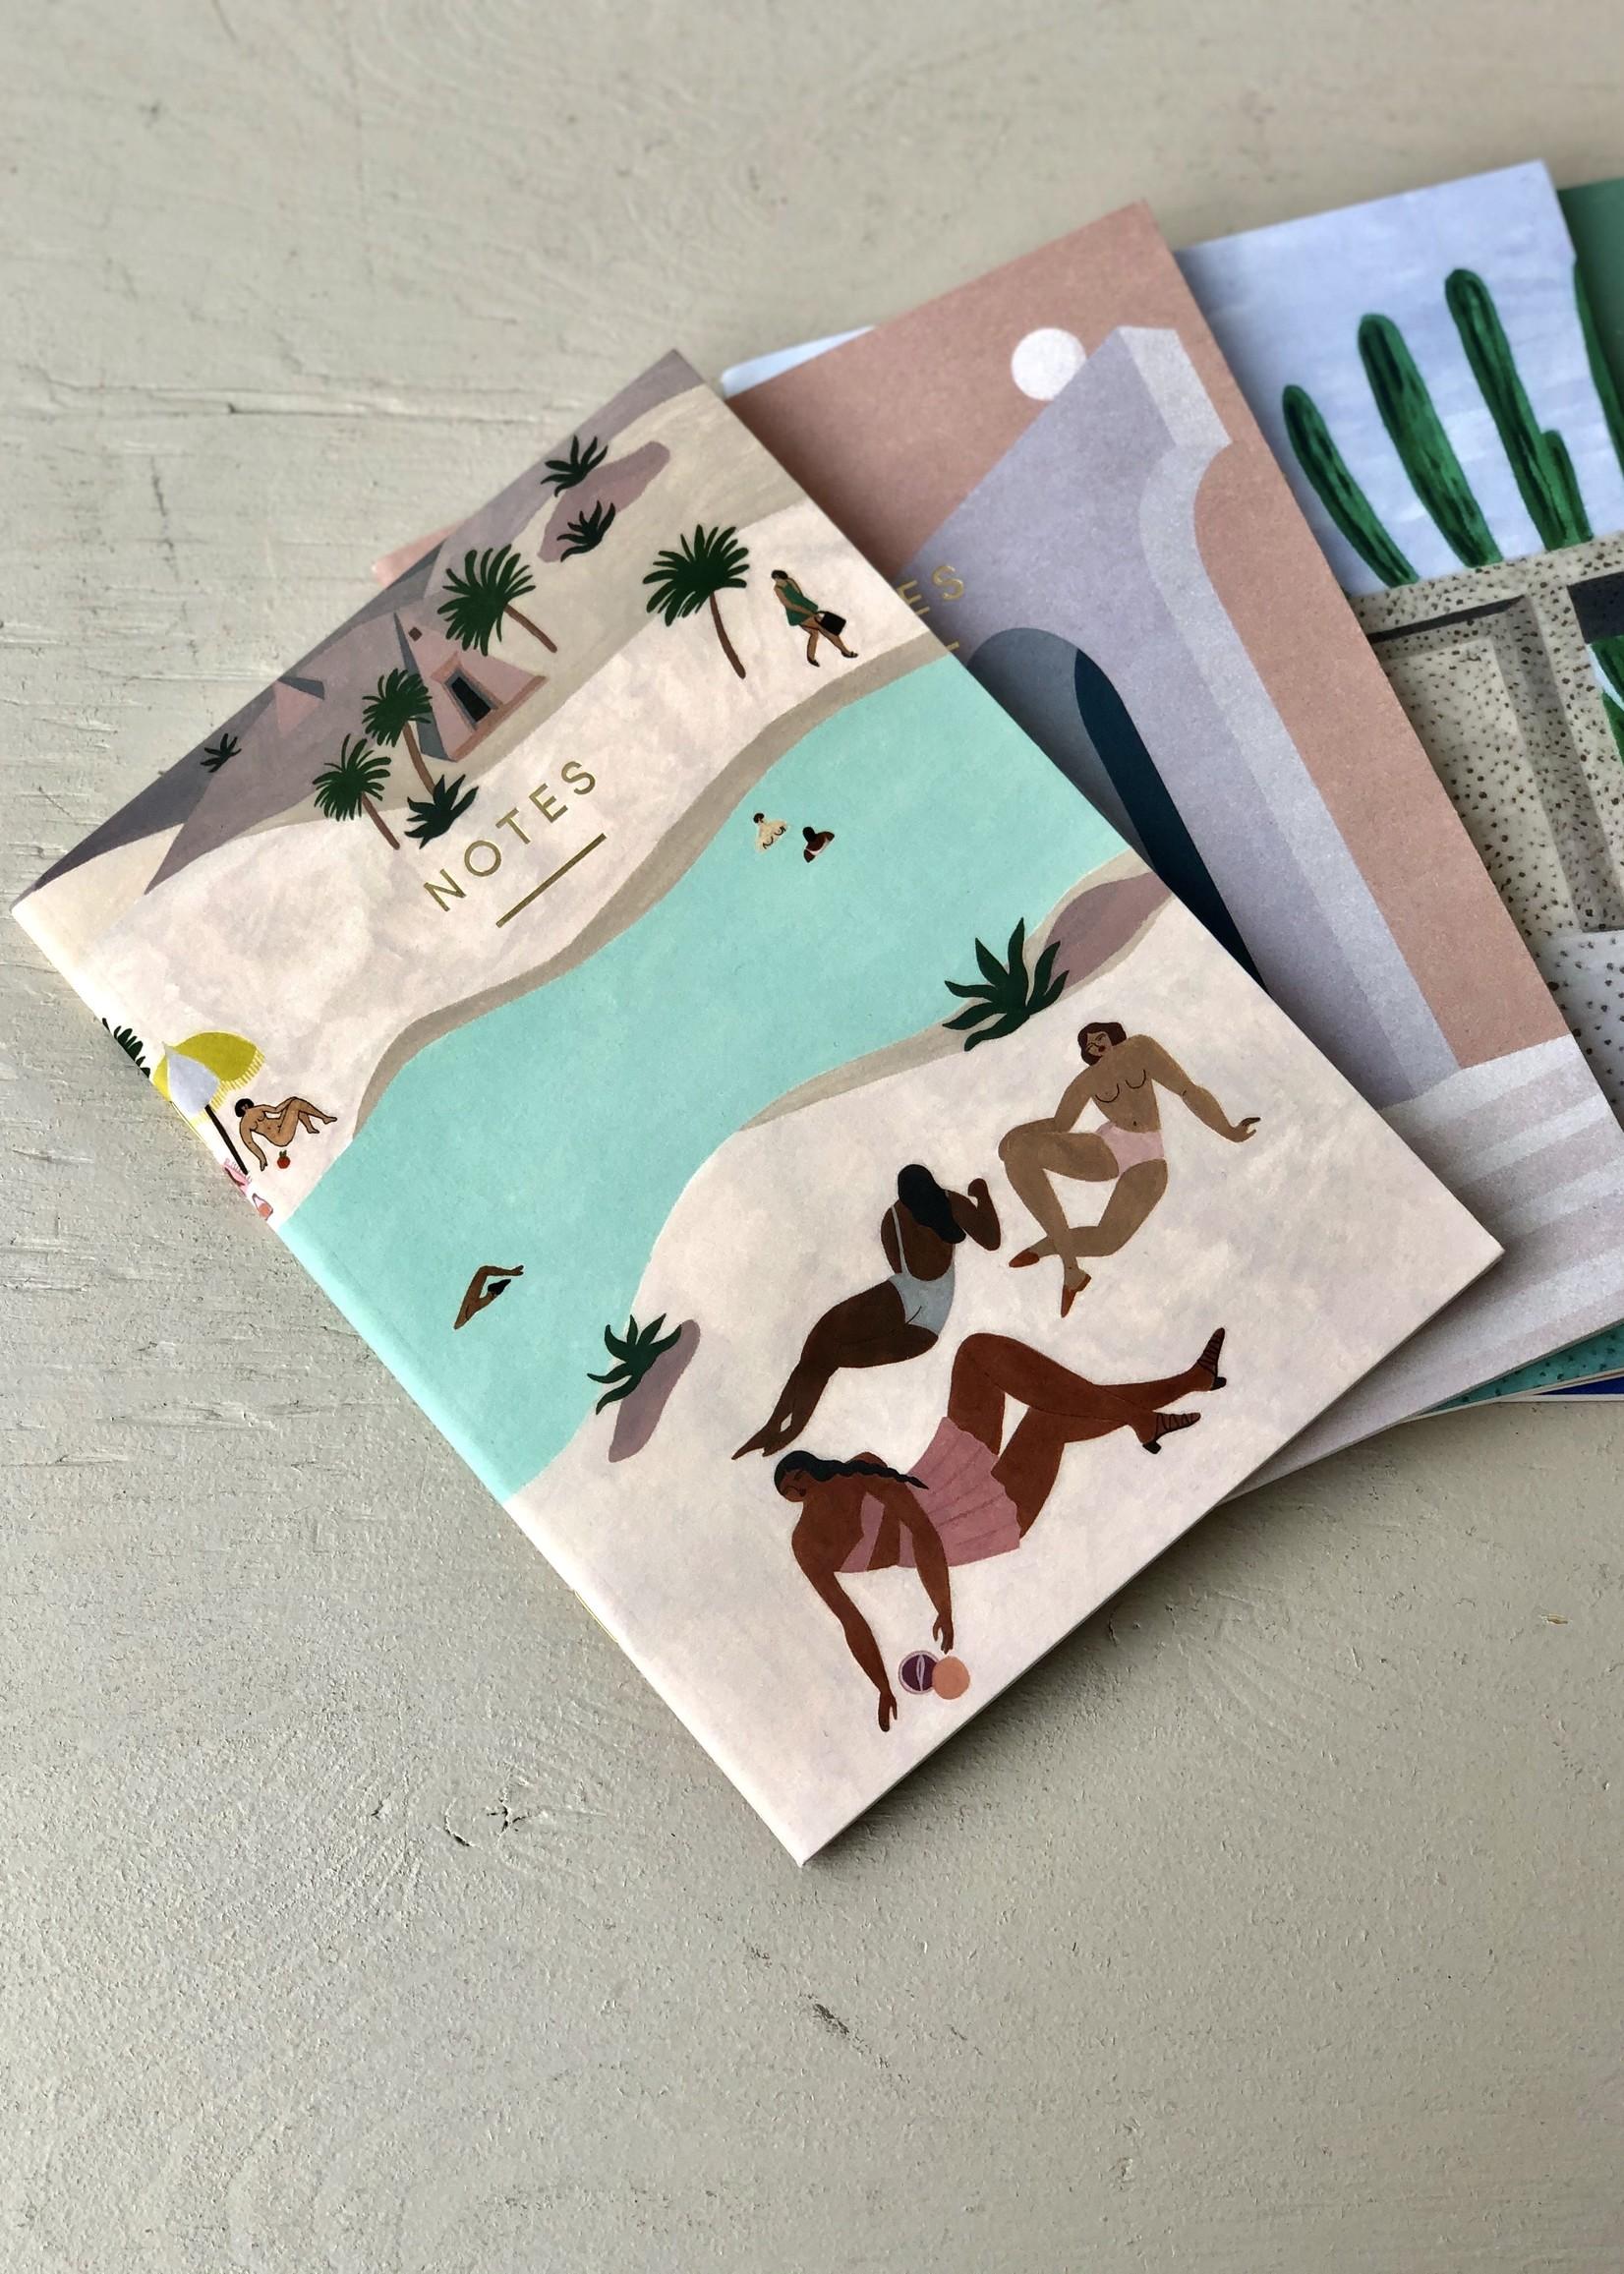 Wrap Stationery Wrap Stationery Notebooks